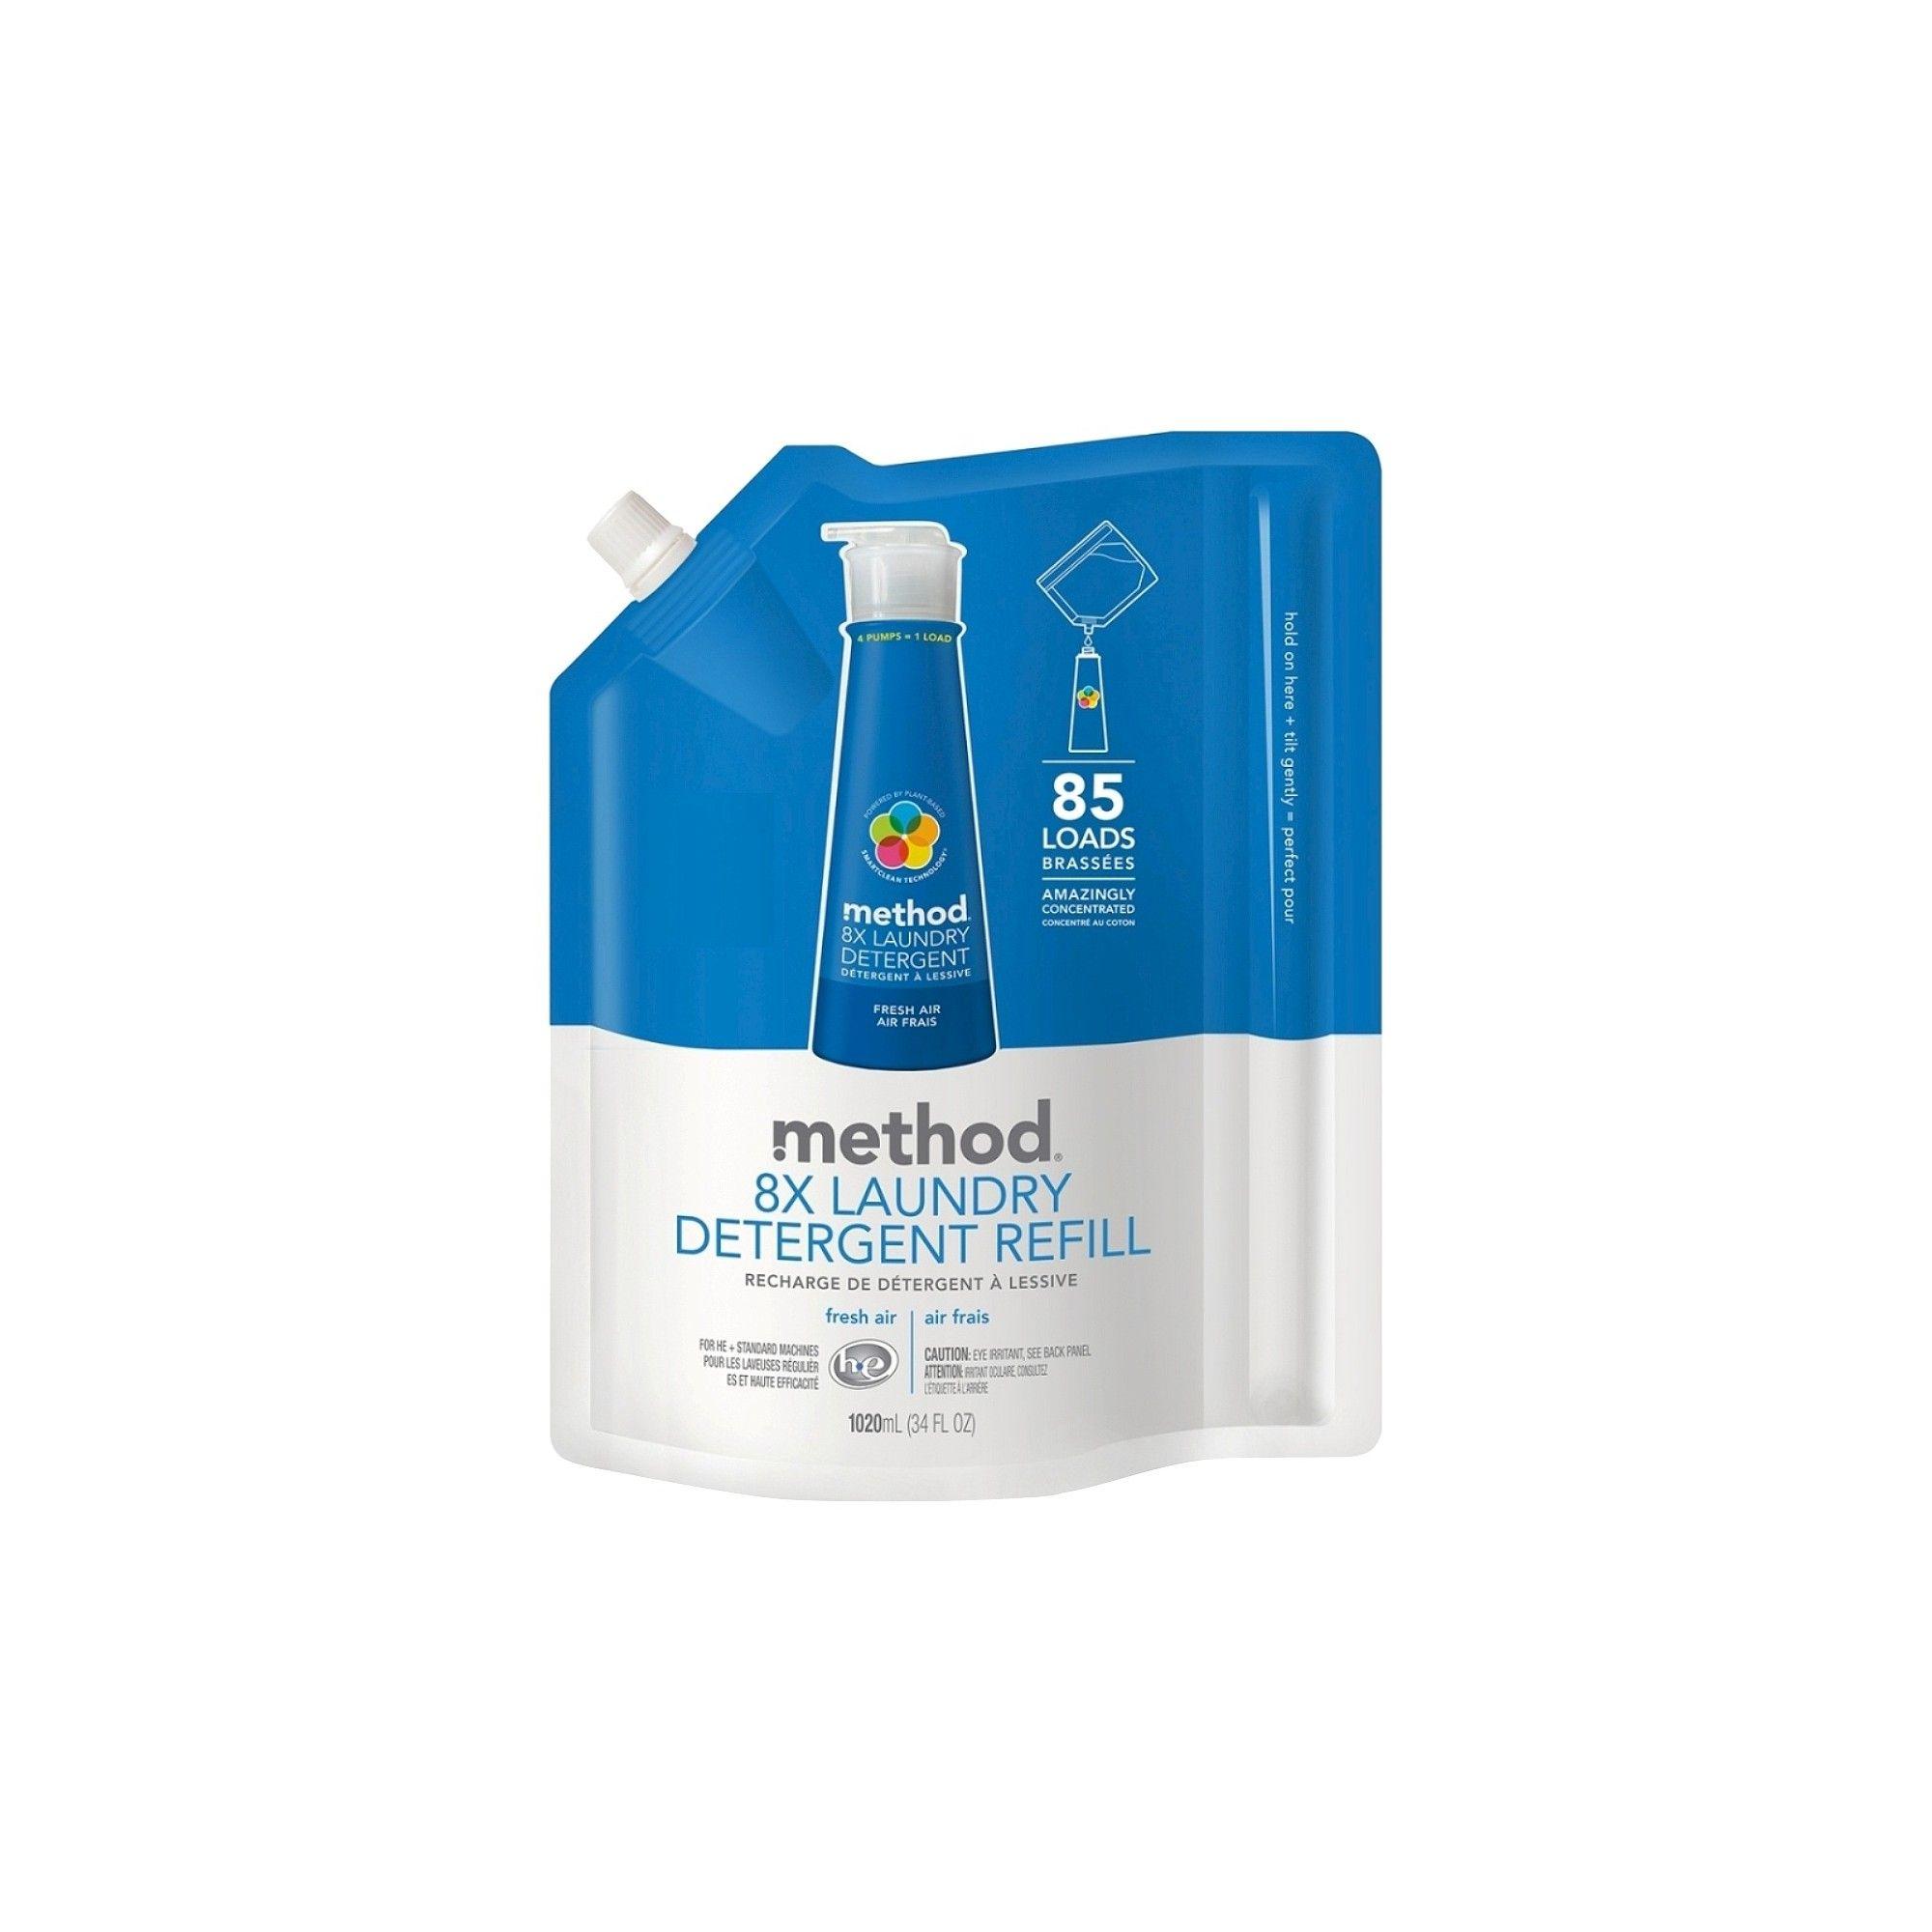 Method Fresh Air High Efficiency Laundry Detergent Refill 34 Oz